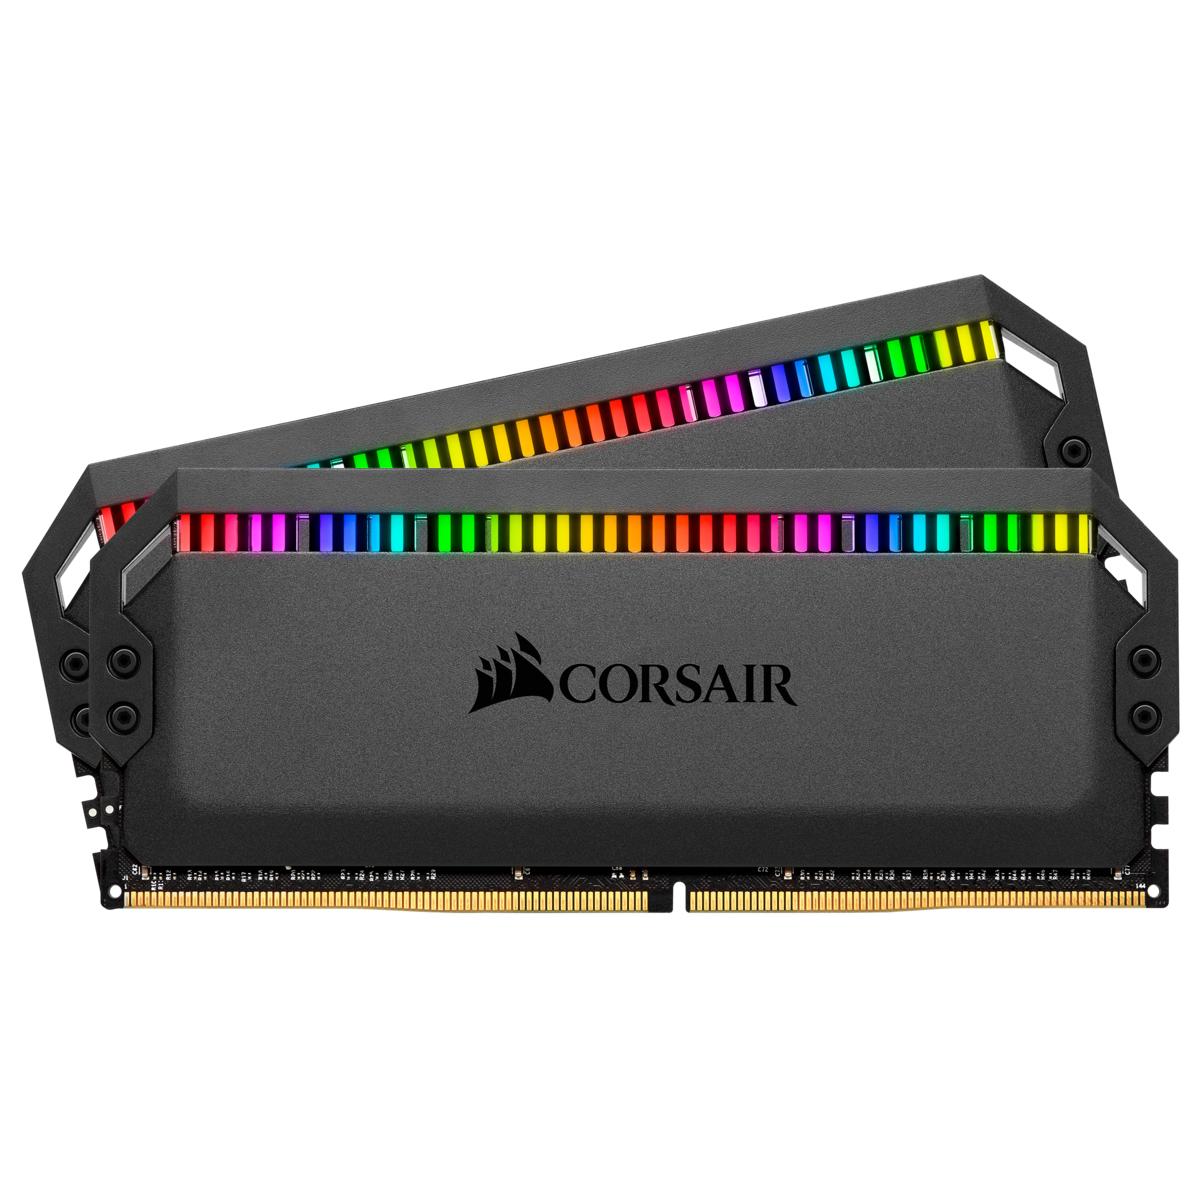 Corsair Platinum RGB memory module 16 GB DDR4 3000 MHz